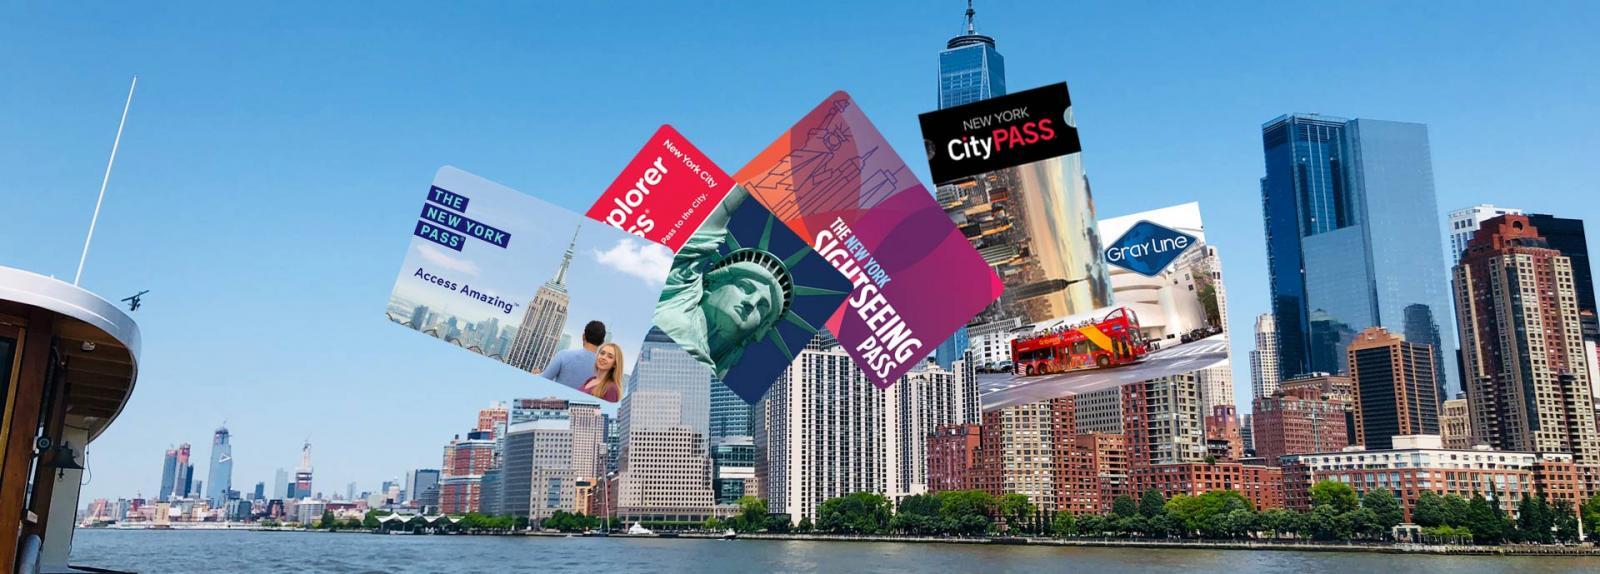 ultimativer new york pass vergleich alle 7 erfahrungen september 2018. Black Bedroom Furniture Sets. Home Design Ideas